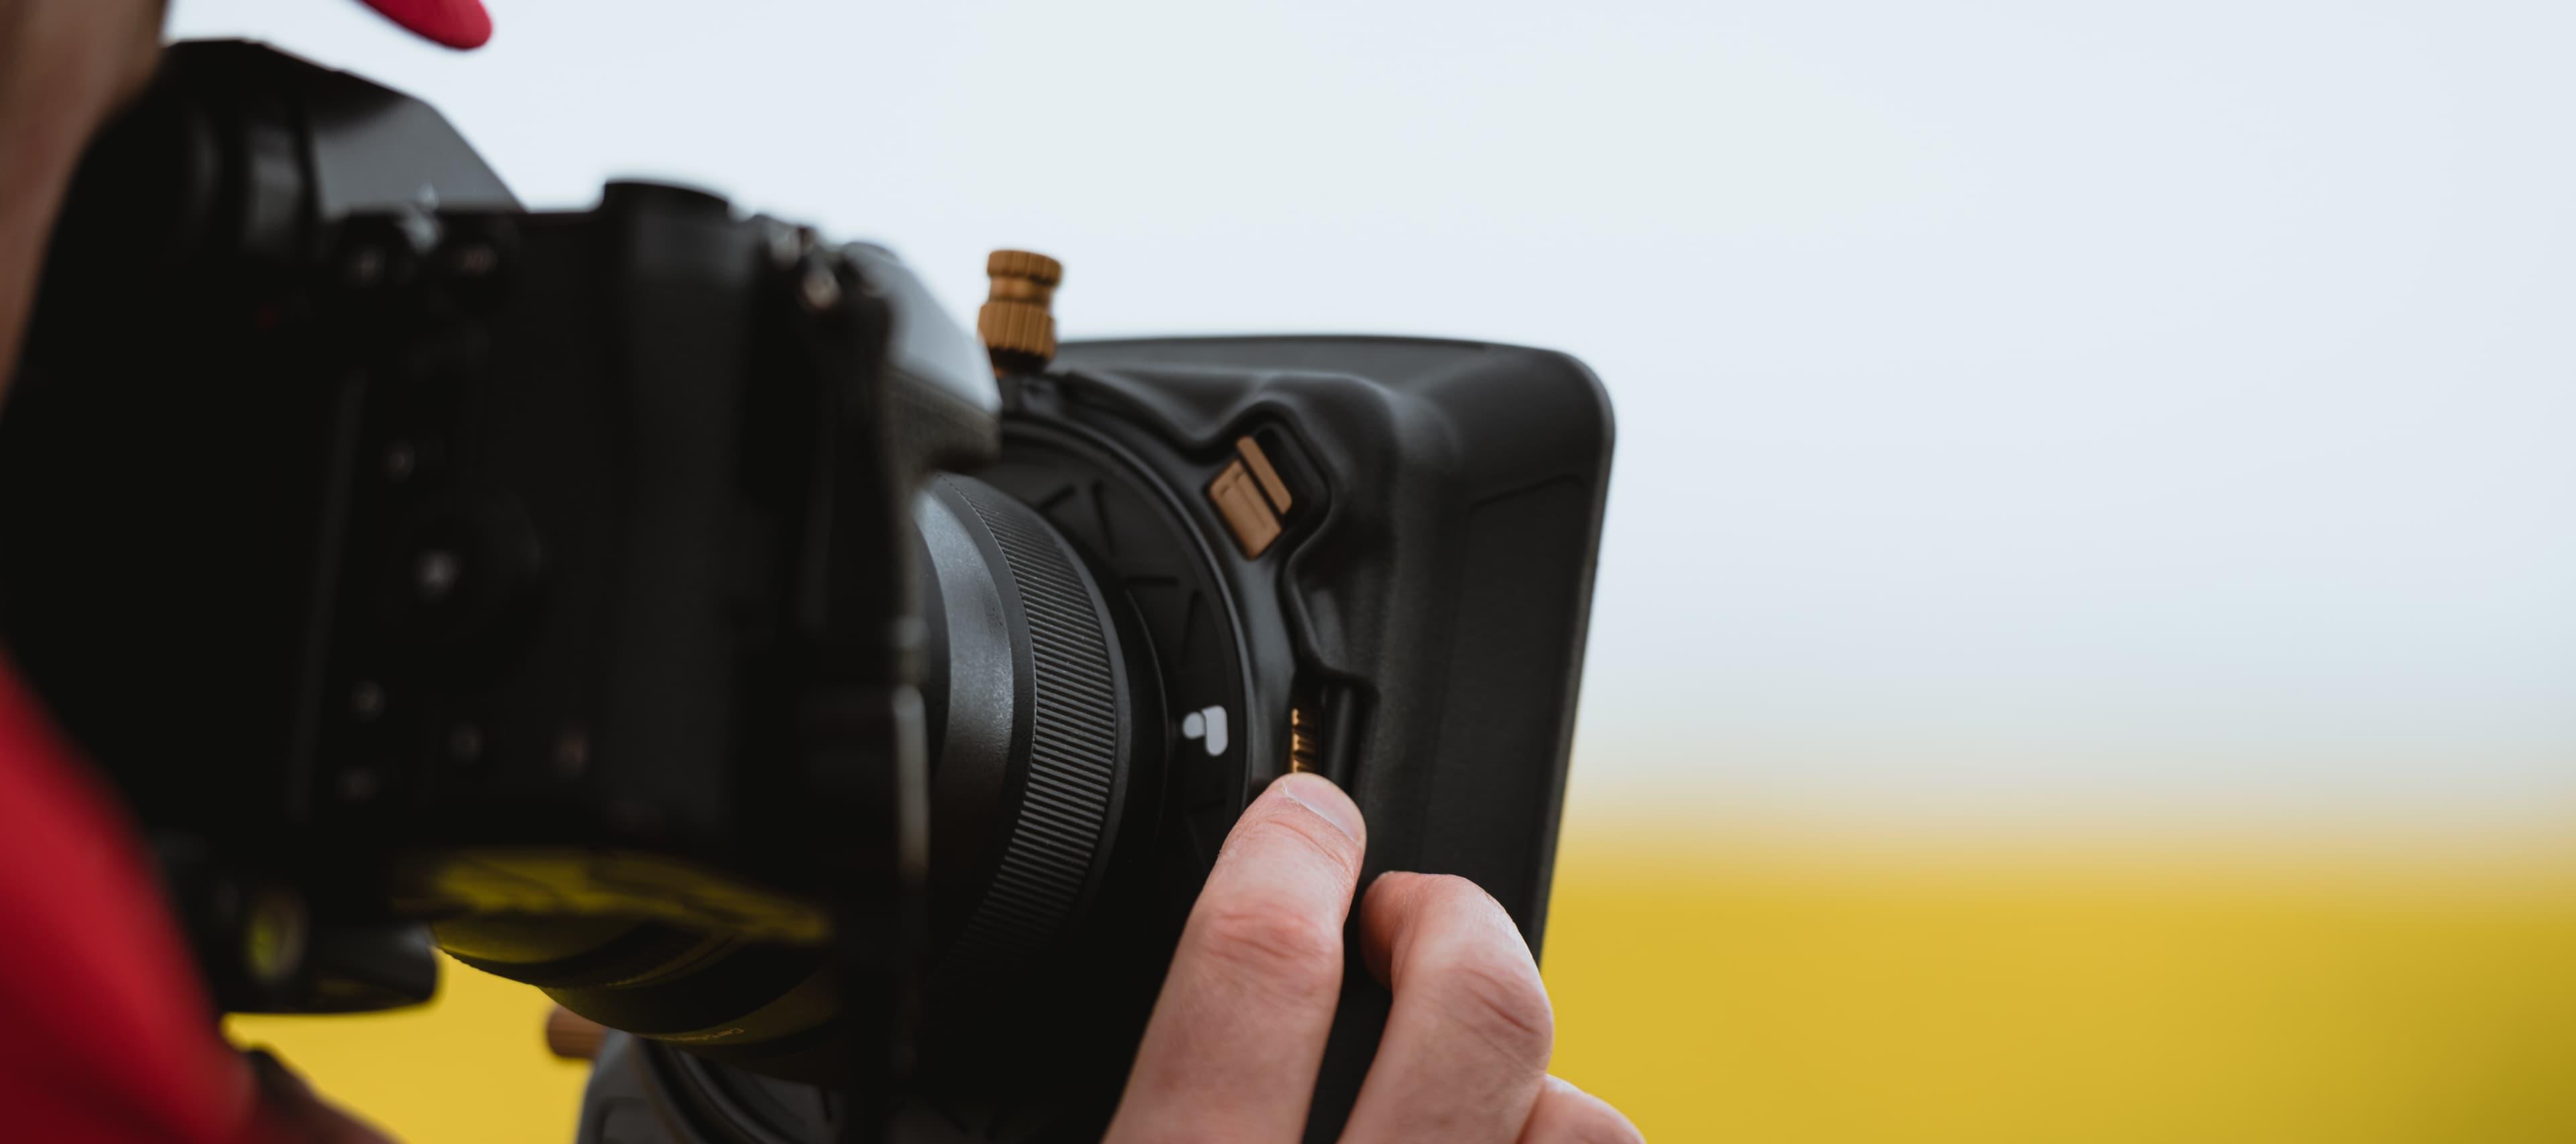 Filter Holder, Square Filter Holder, Camera Filter Holder, ND Filter Holder